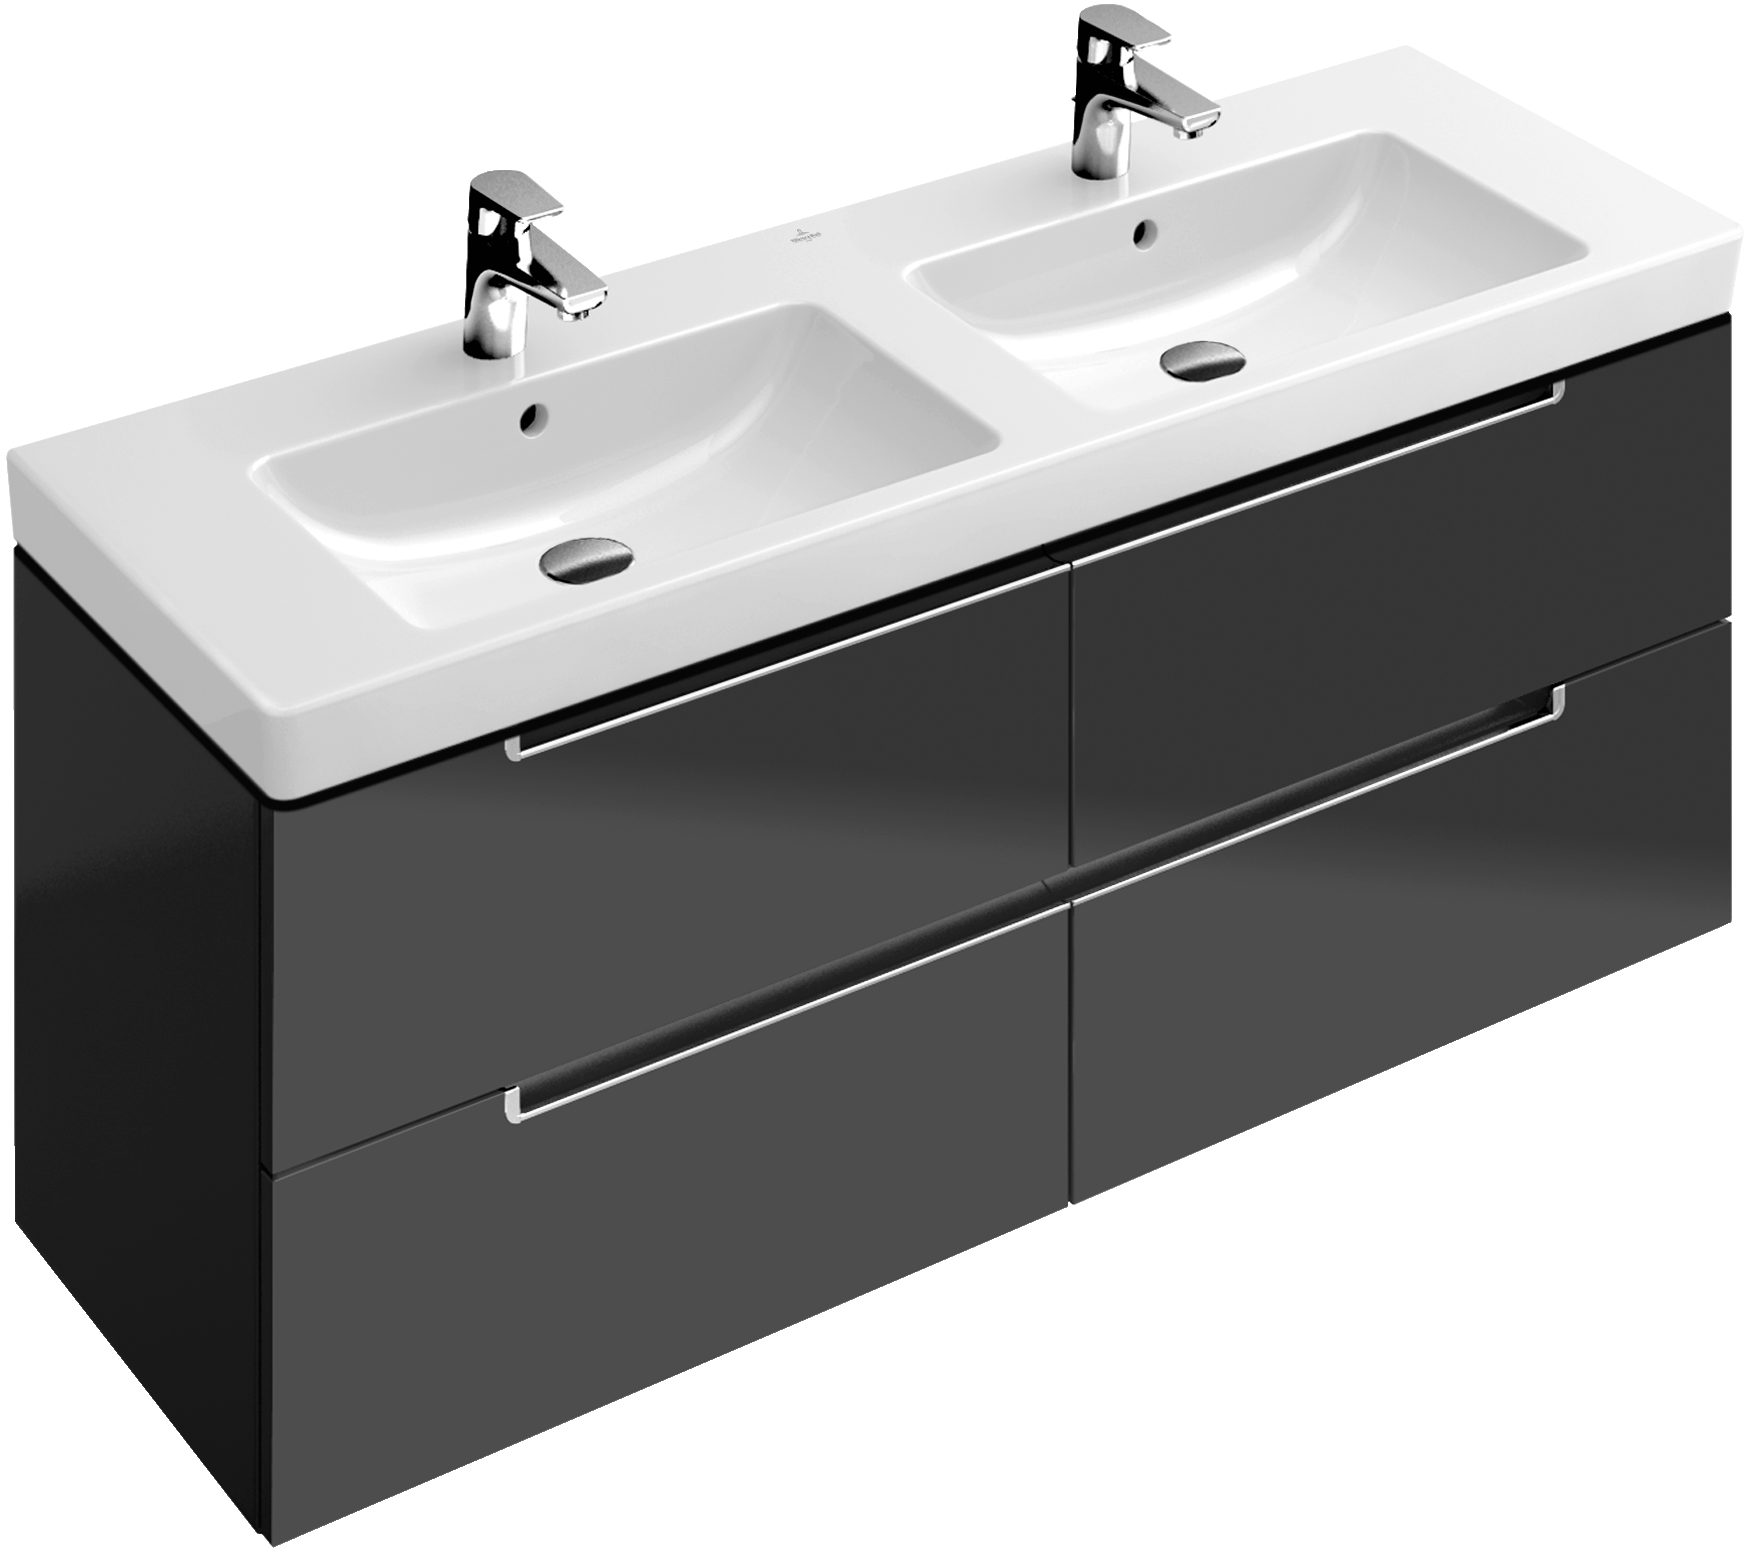 badm bel unter waschtisch. Black Bedroom Furniture Sets. Home Design Ideas